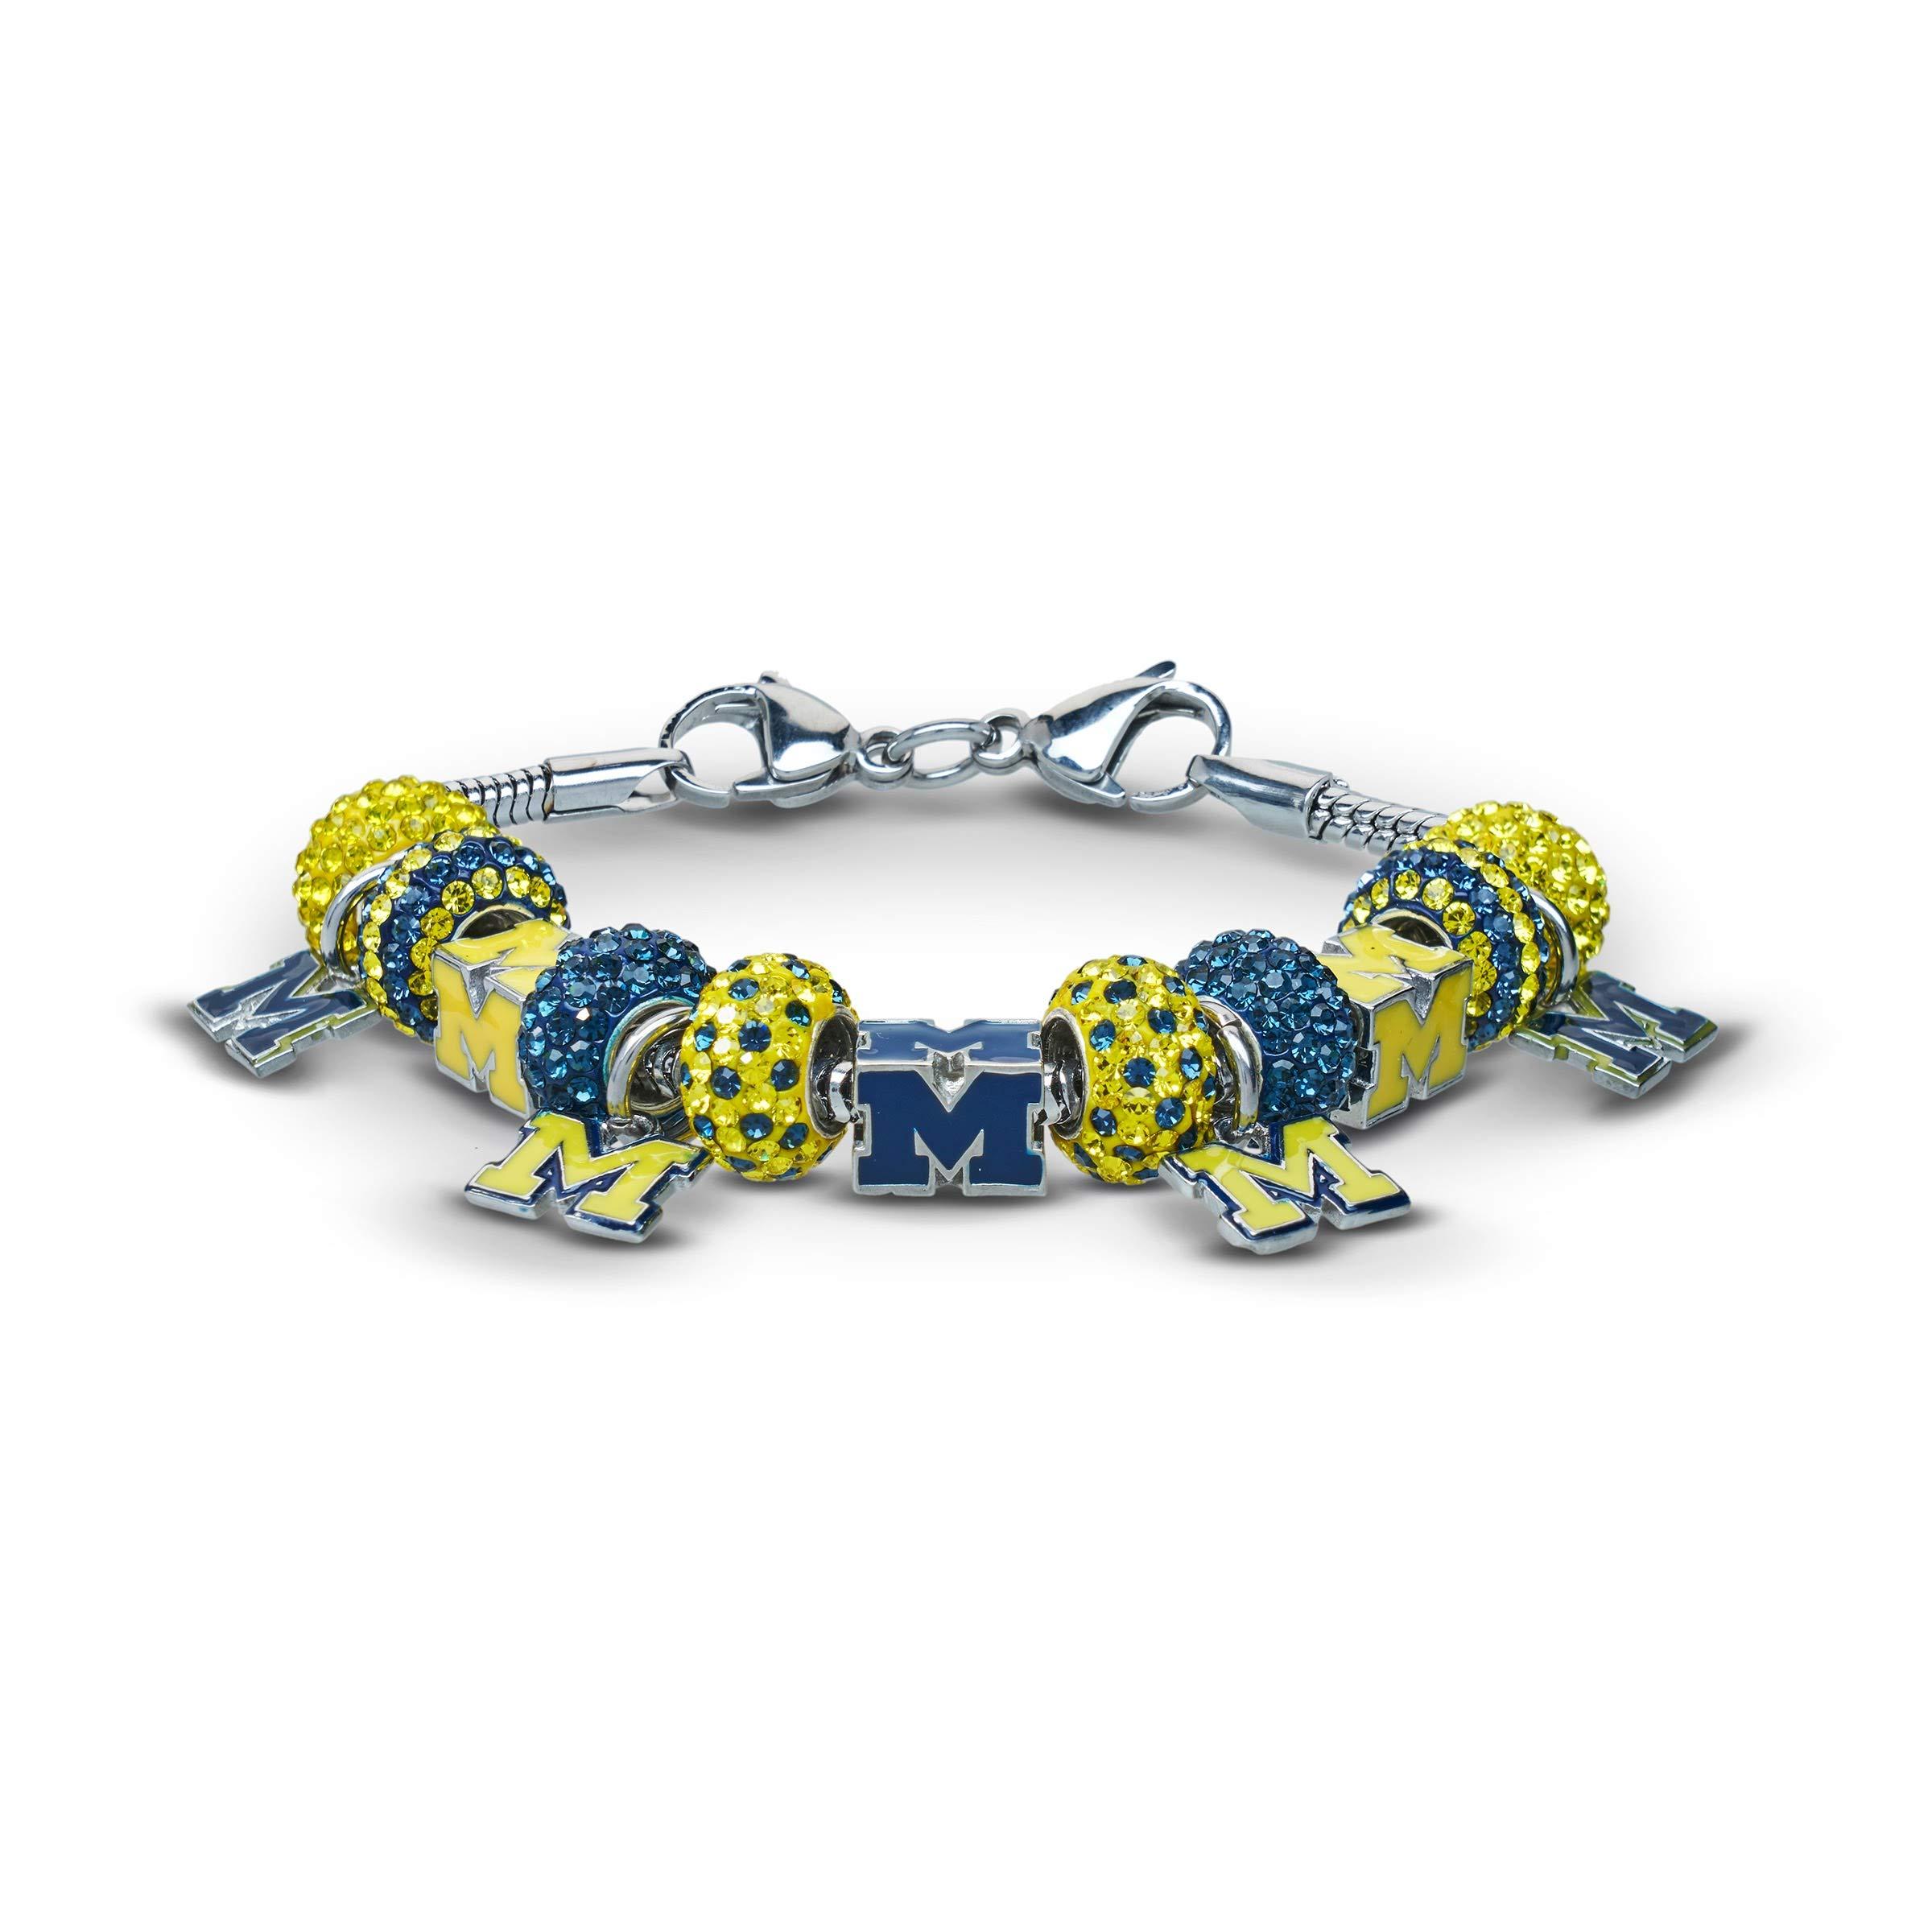 Stone Armory University of Michigan Wolverines Charm Bracelet Jewelry | University of Michigan Charm Bracelet | Michigan Bracelet | UM Wolverines Jewelry